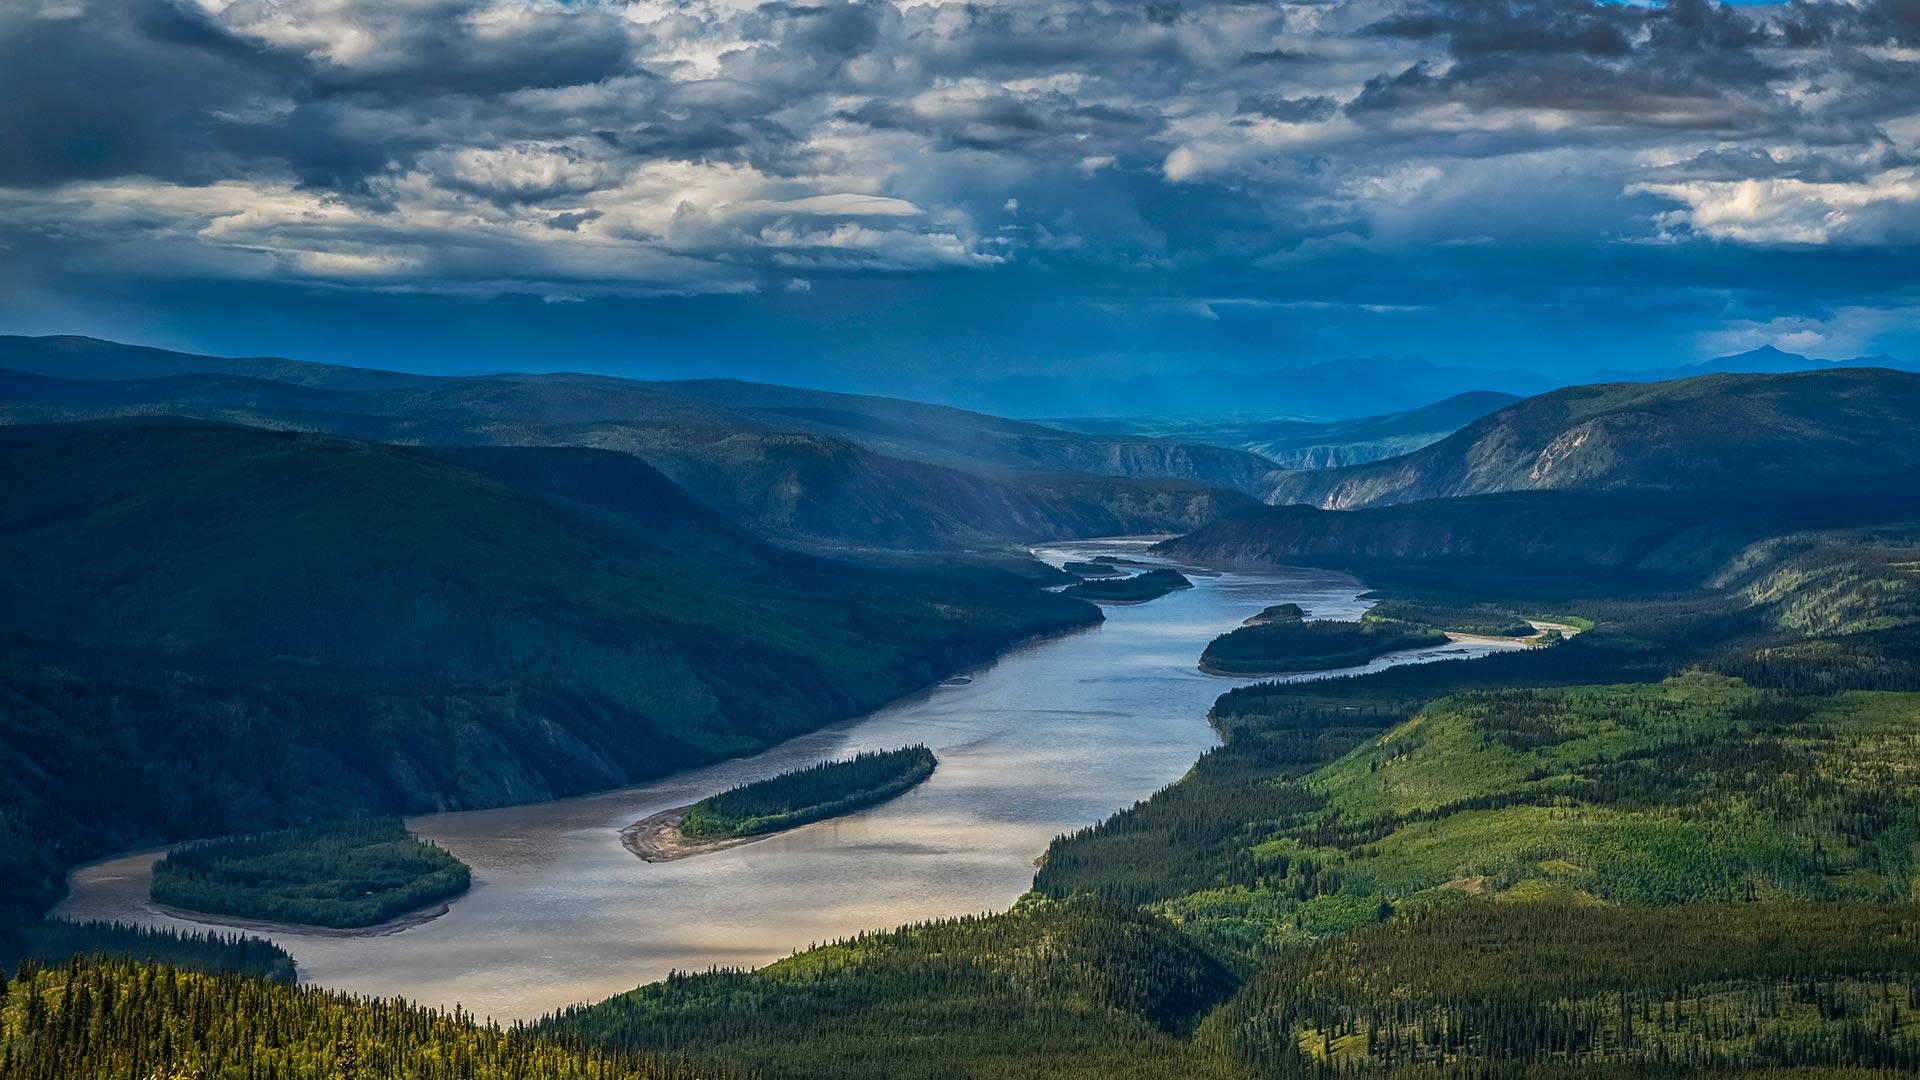 Yukon River viewed from the Midnight Dome, Dawson City, Yukon, Canada (© Robert Postma/Getty Images)(Bing United States)